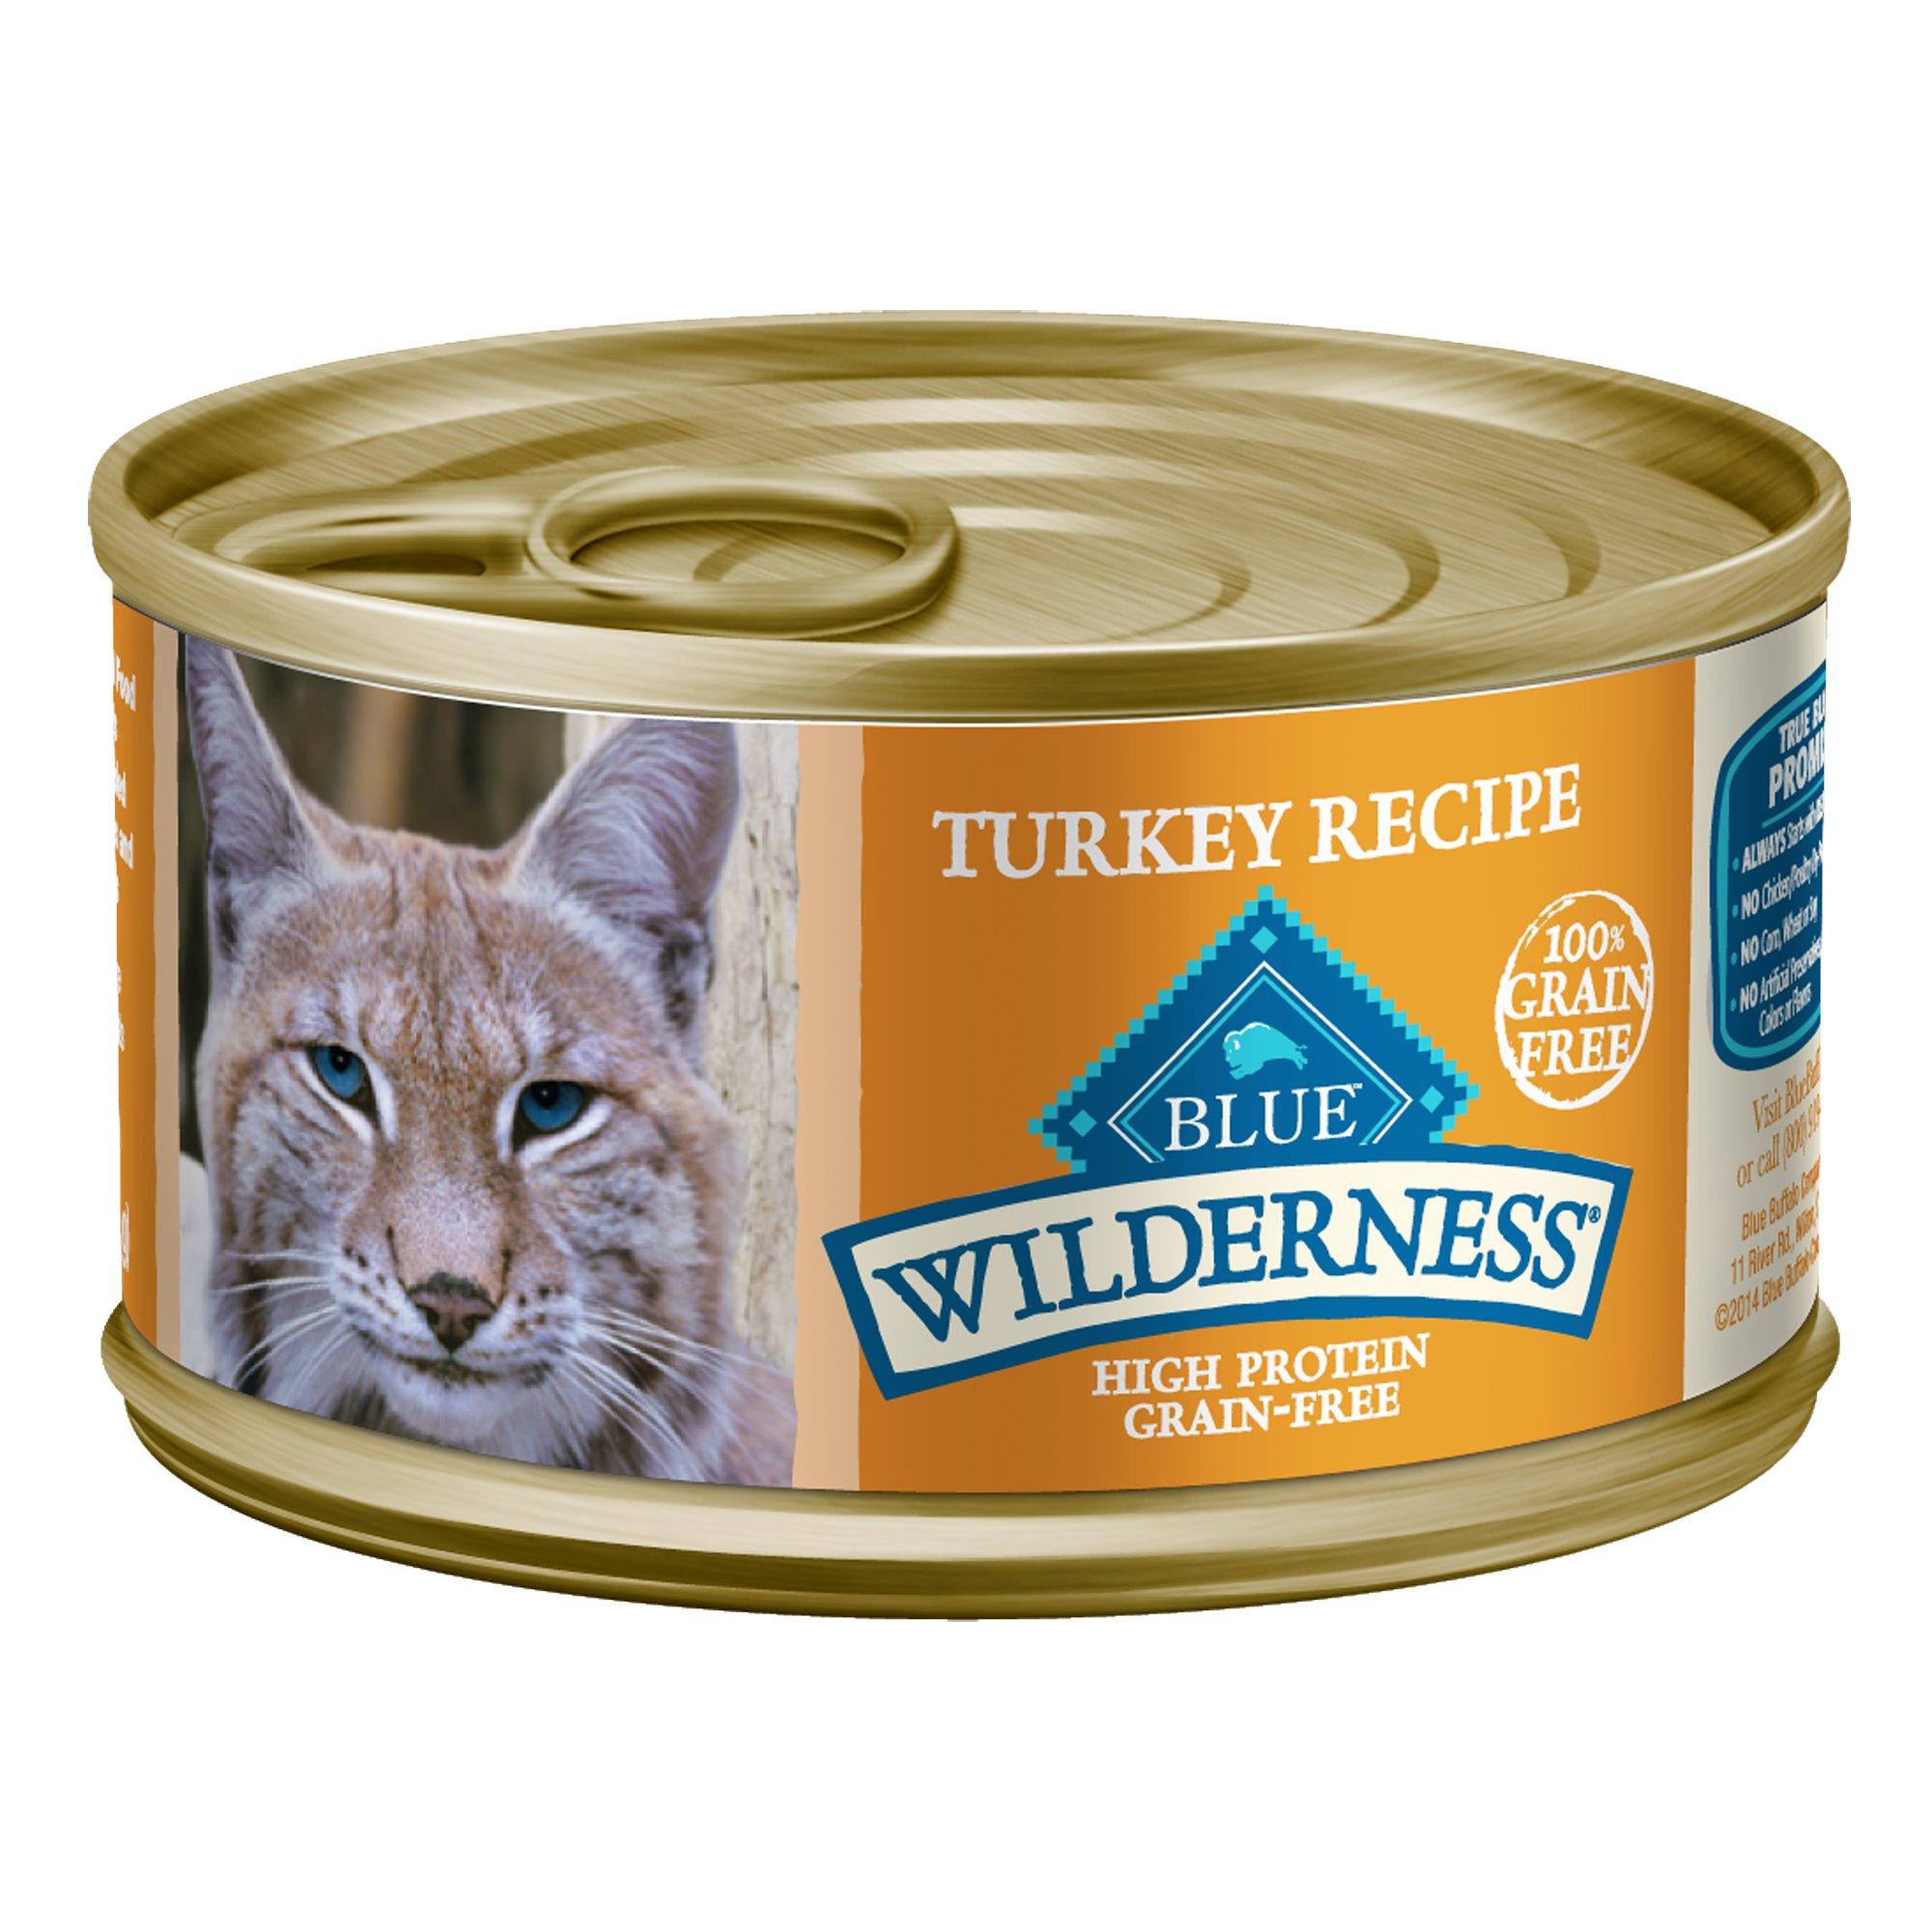 Blue Wilderness Turkey Canned Cat Food